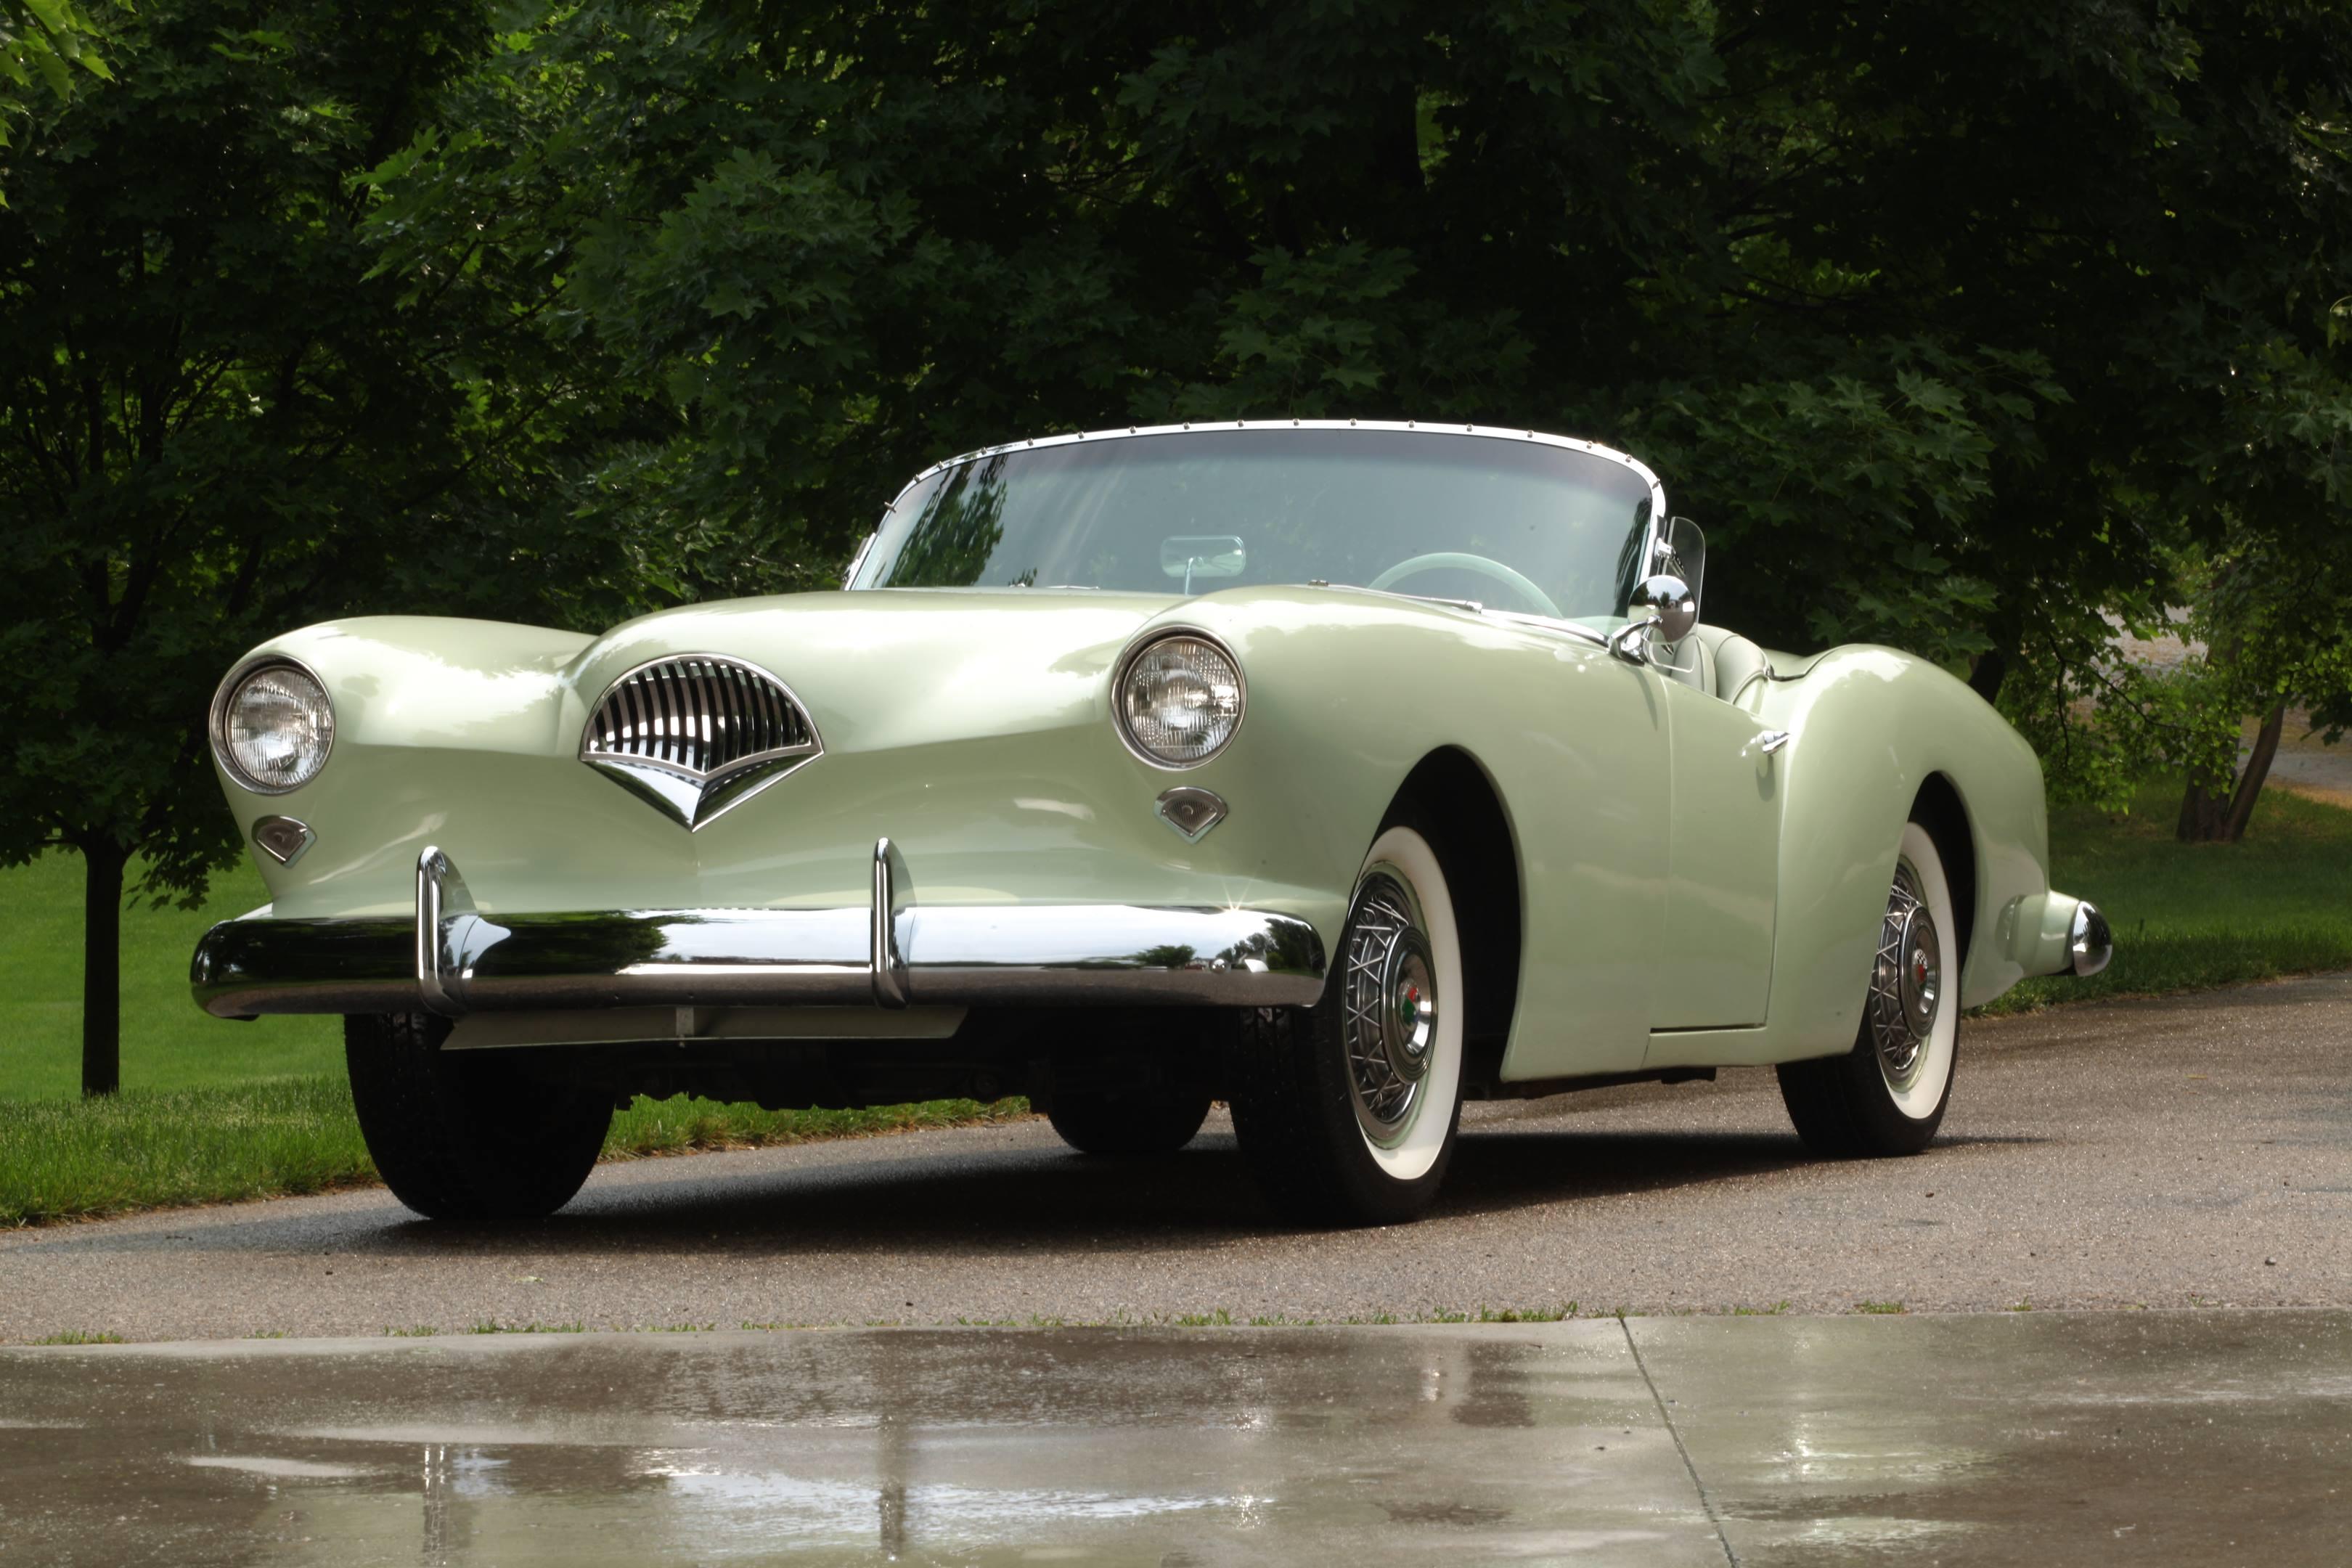 1954 Kaiser Darrin front 3/4